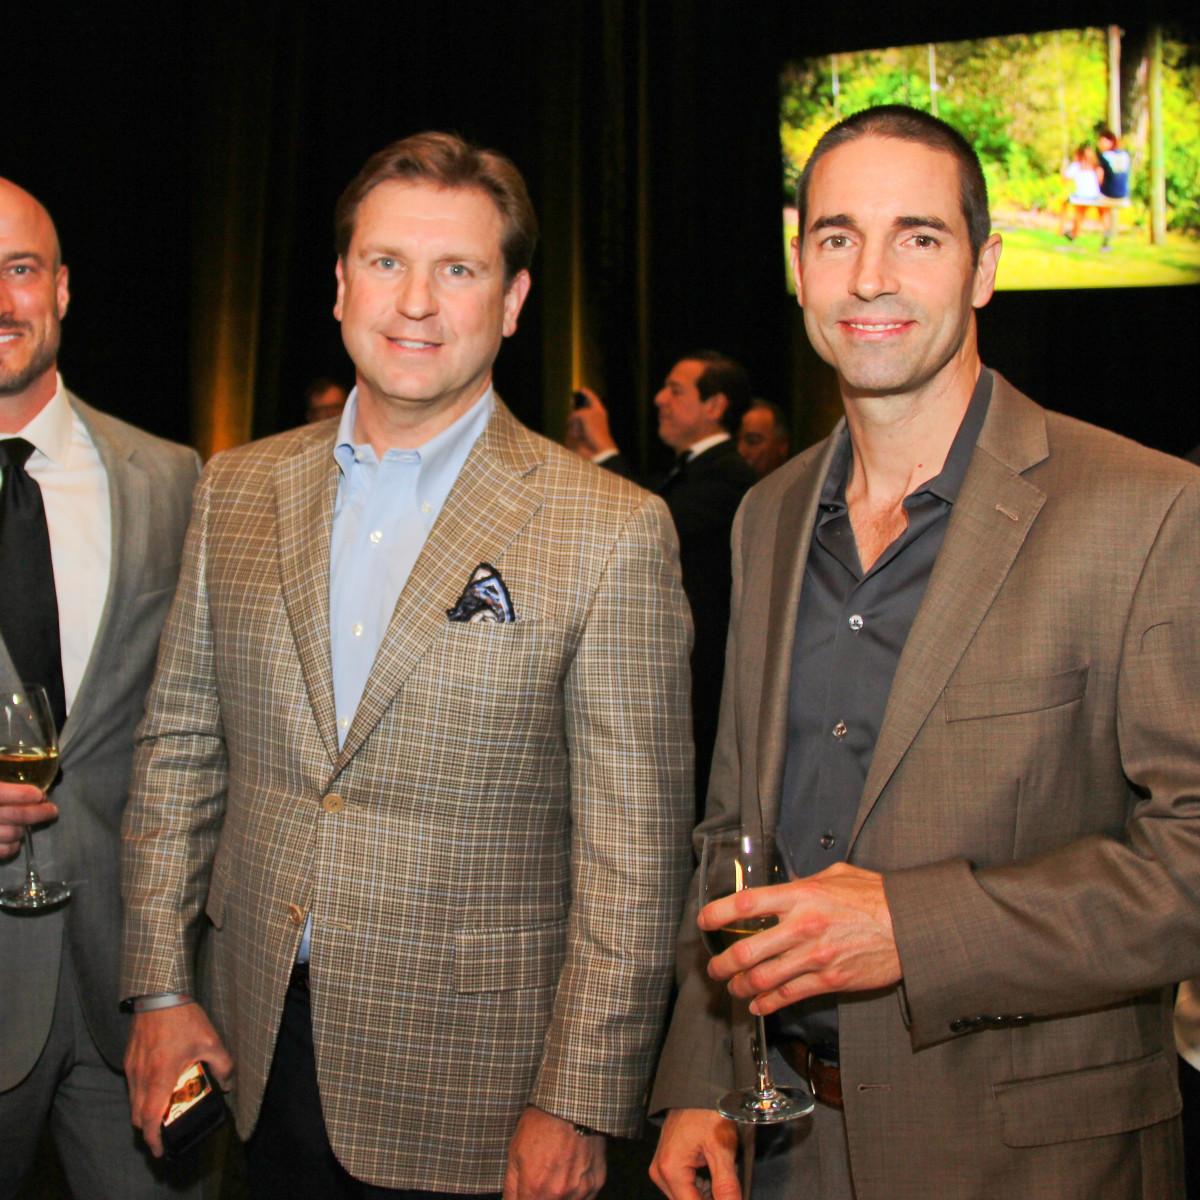 Houston, Black Tie Boxing Benefiting Lone Survivor Foundation, Feb 2017, Eric Kristiansen, Cory Hawryluck, Brian Caldwell